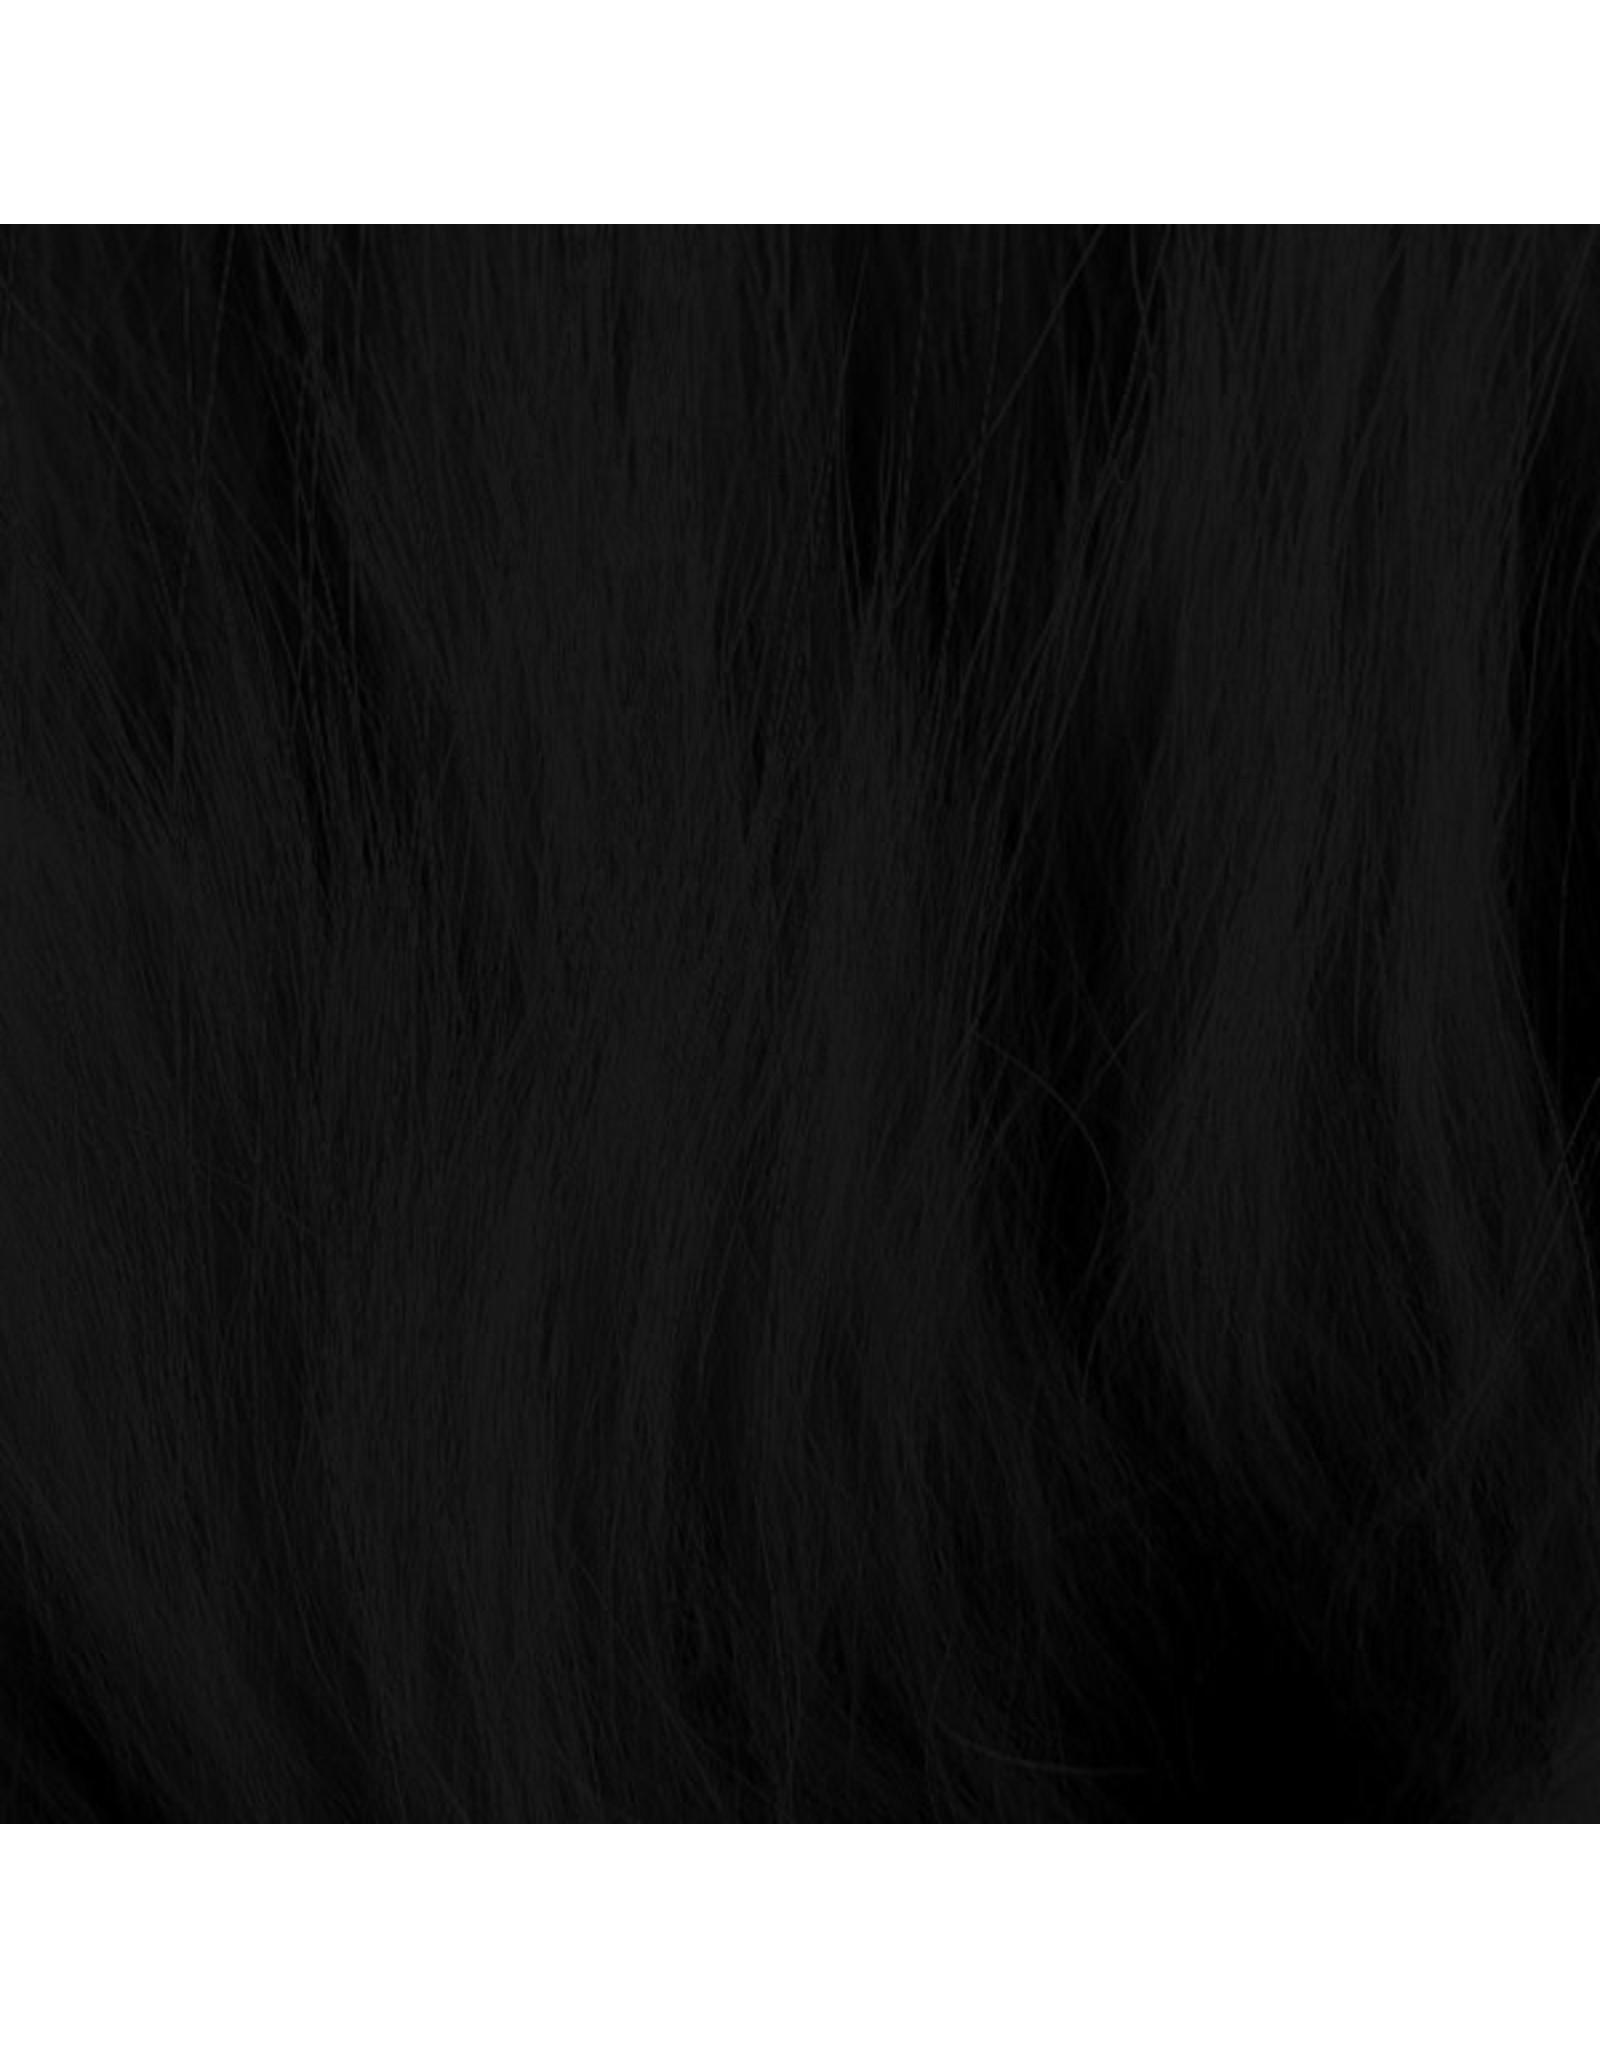 SHOR SHOR Arctic Fox - Black